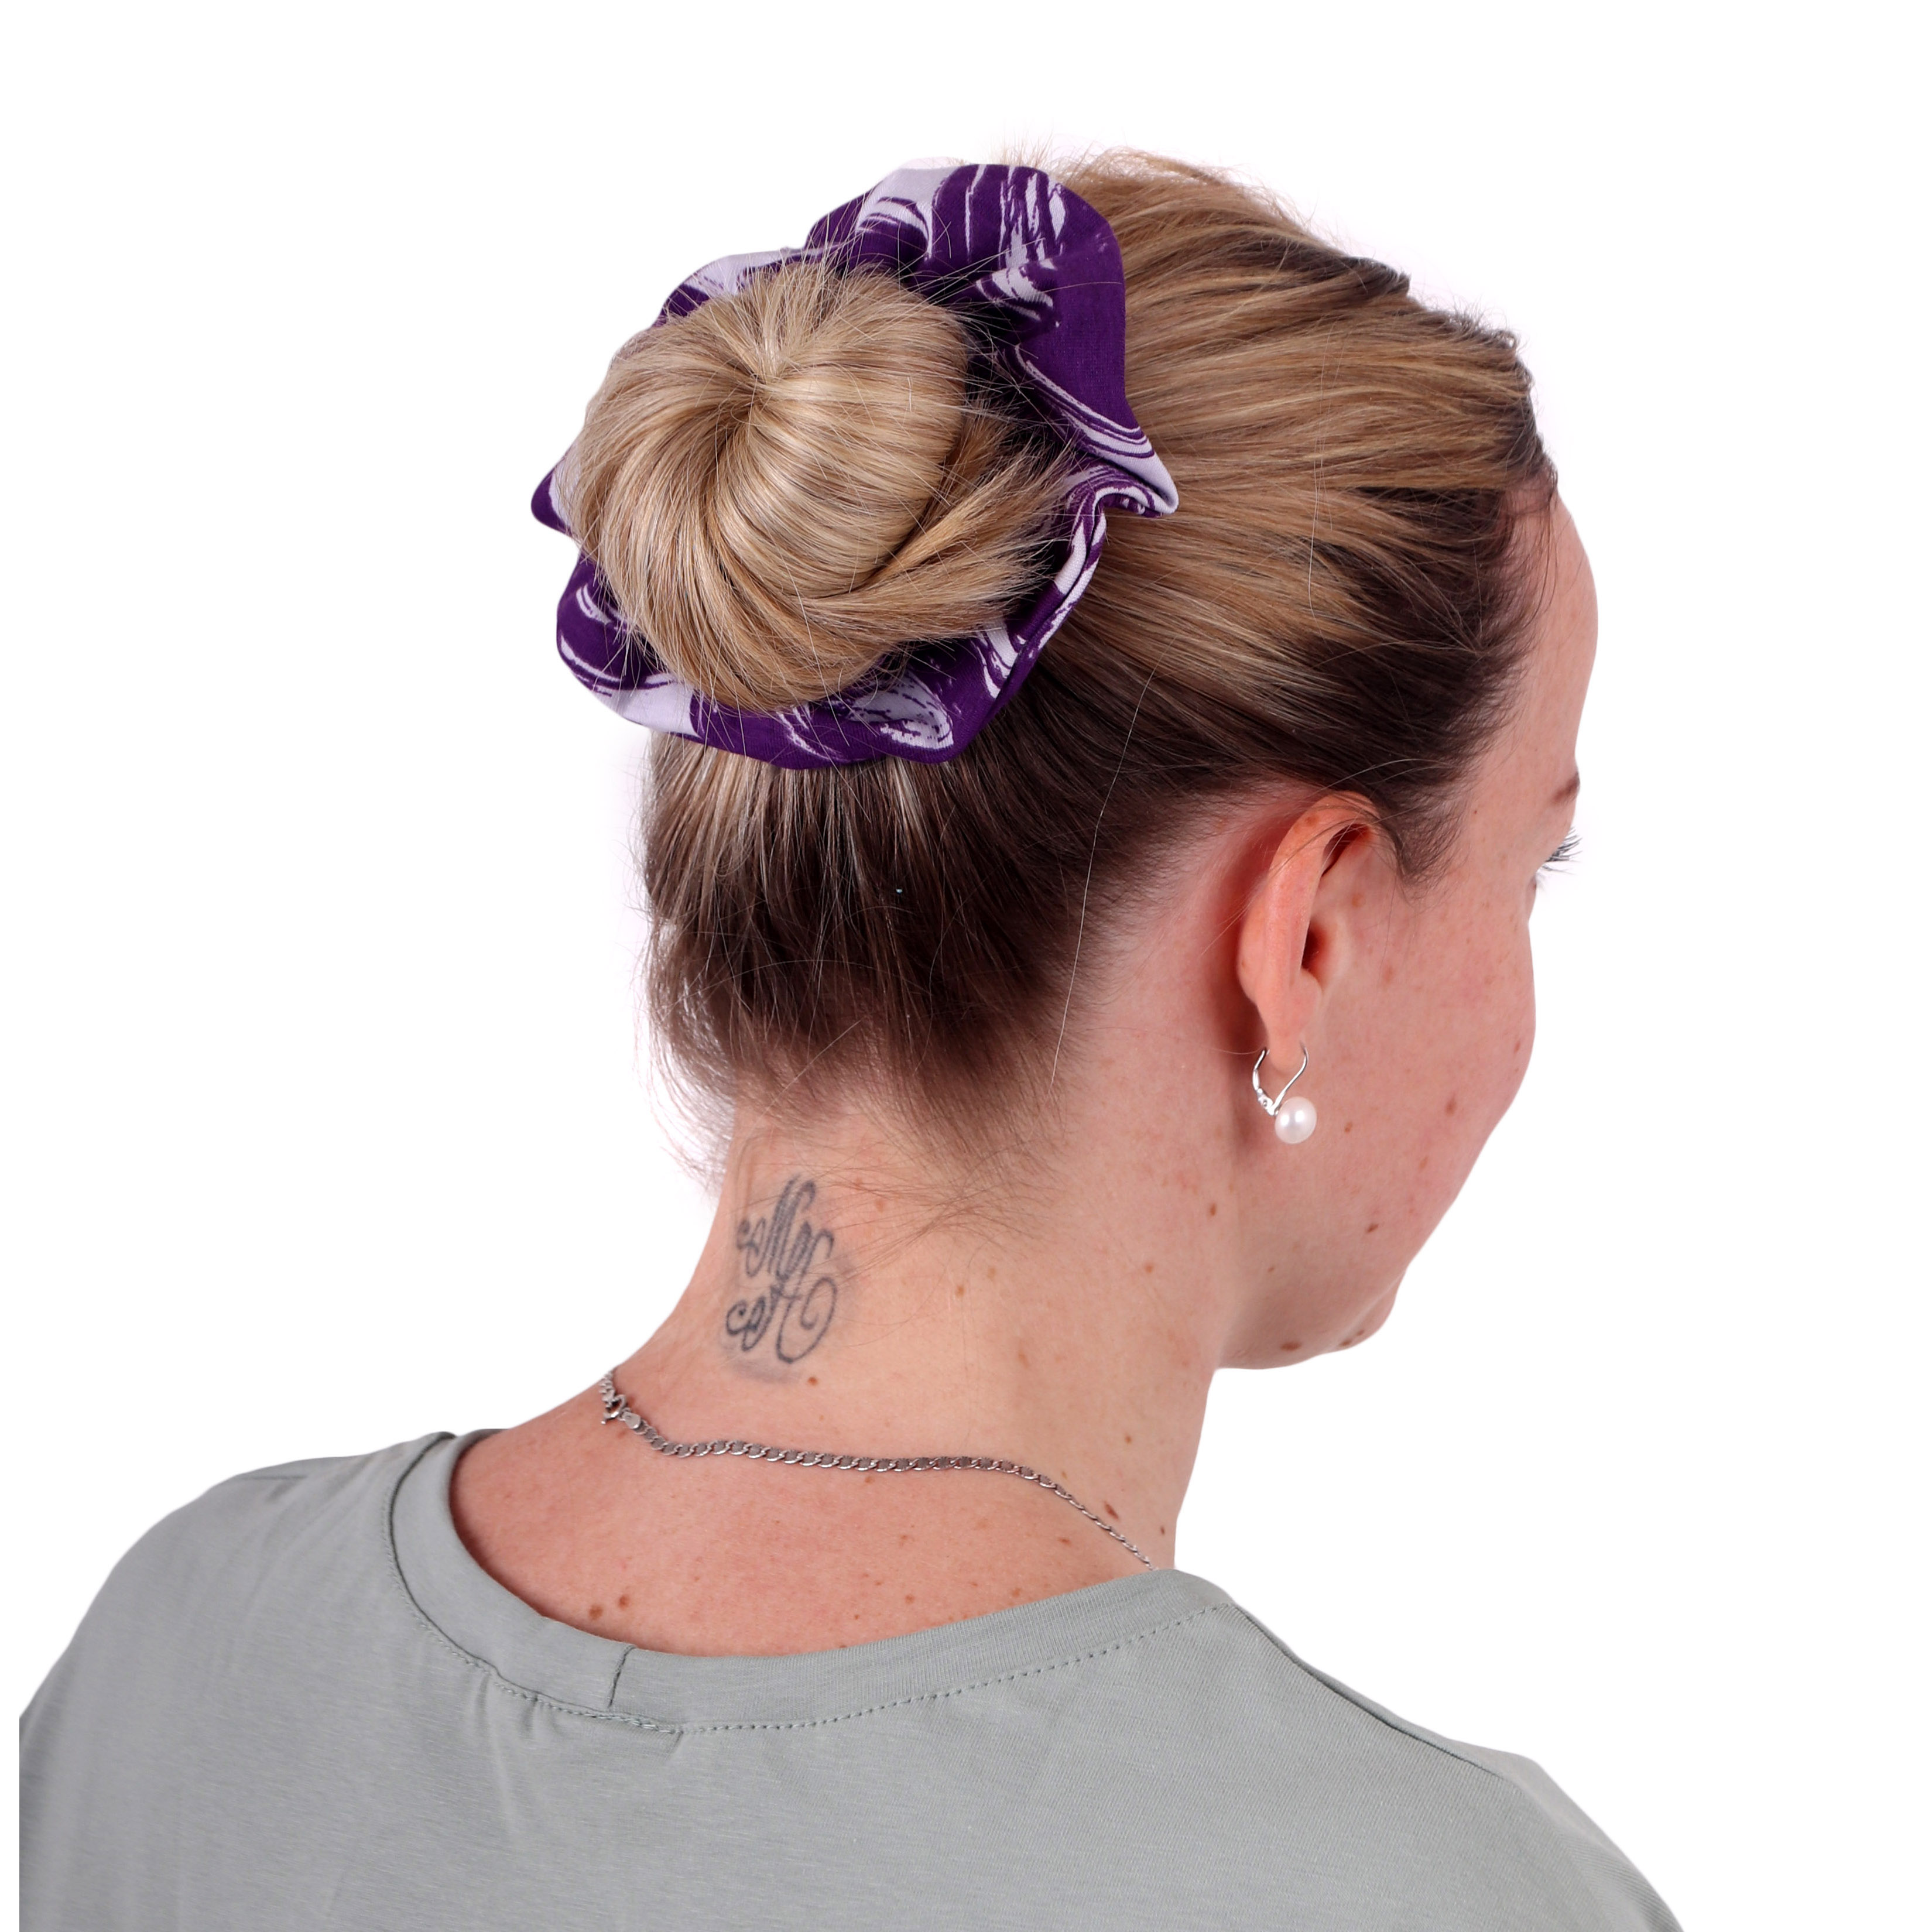 Látková gumička do vlasů, velká, vzorovaná fialová